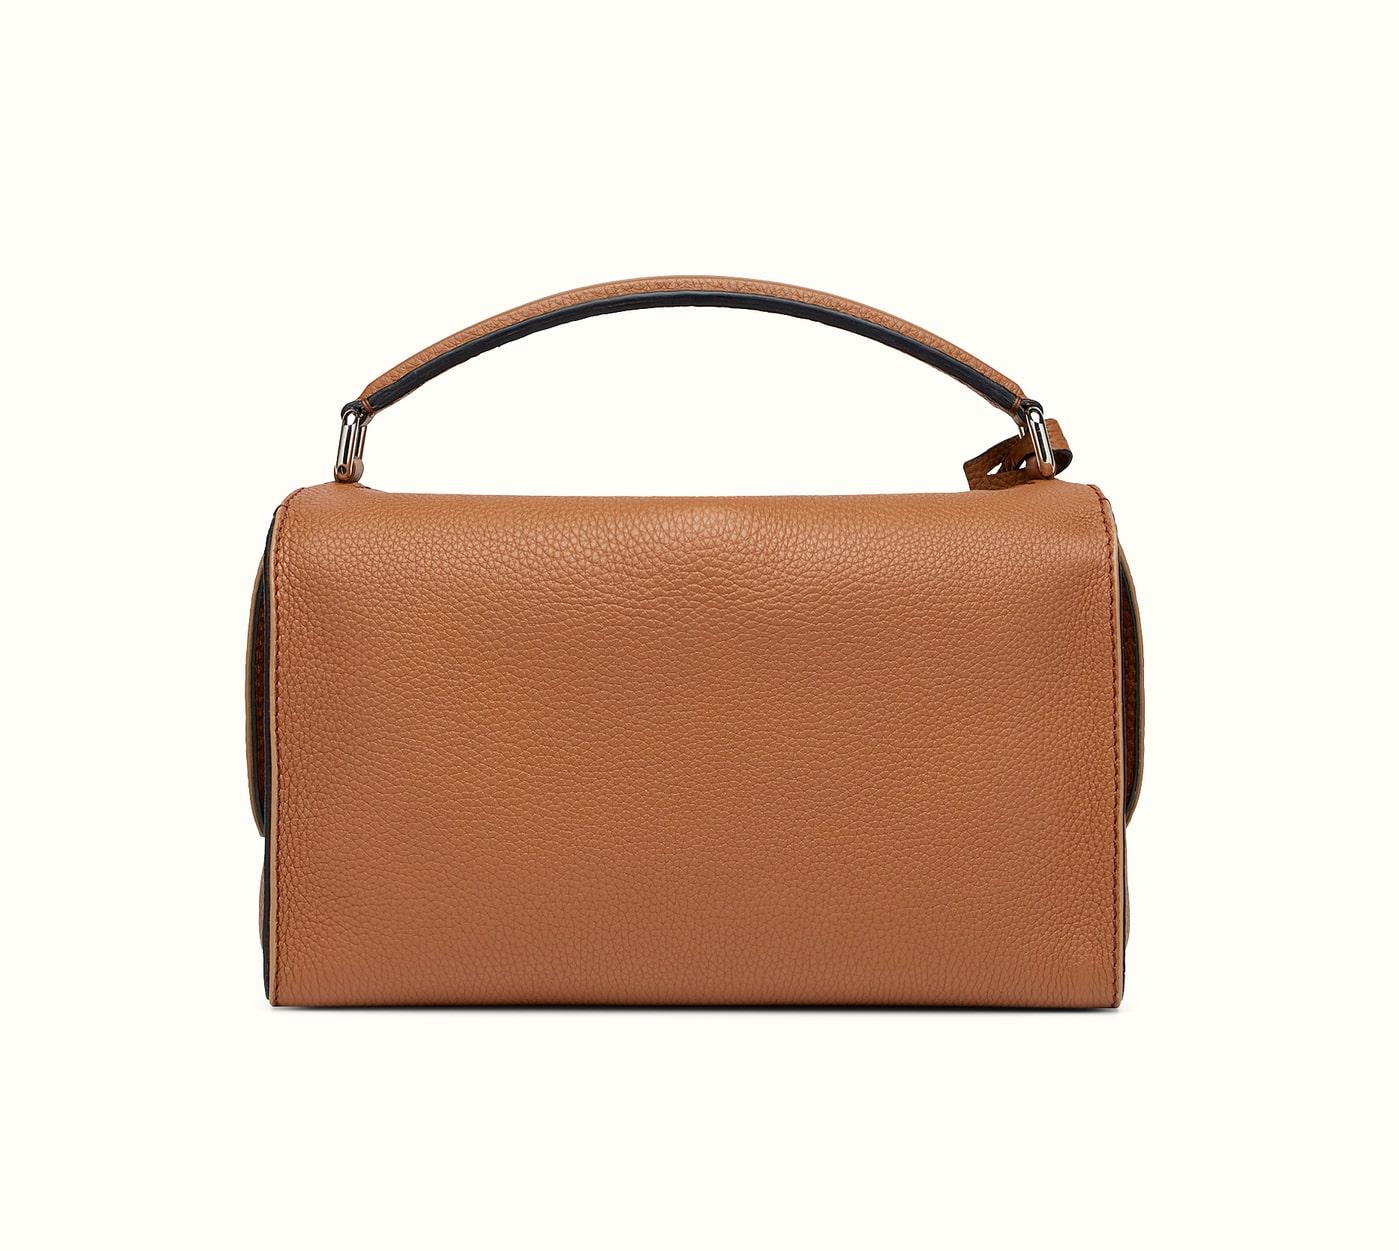 Fendi Lei Selleria Bag Reference Guide  63ce97e8e9a93